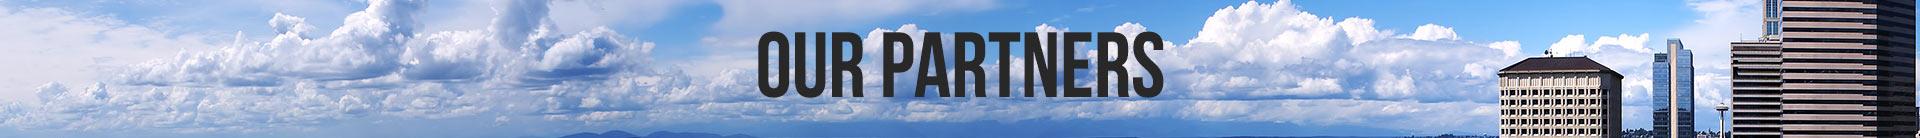 Partners-Banner2